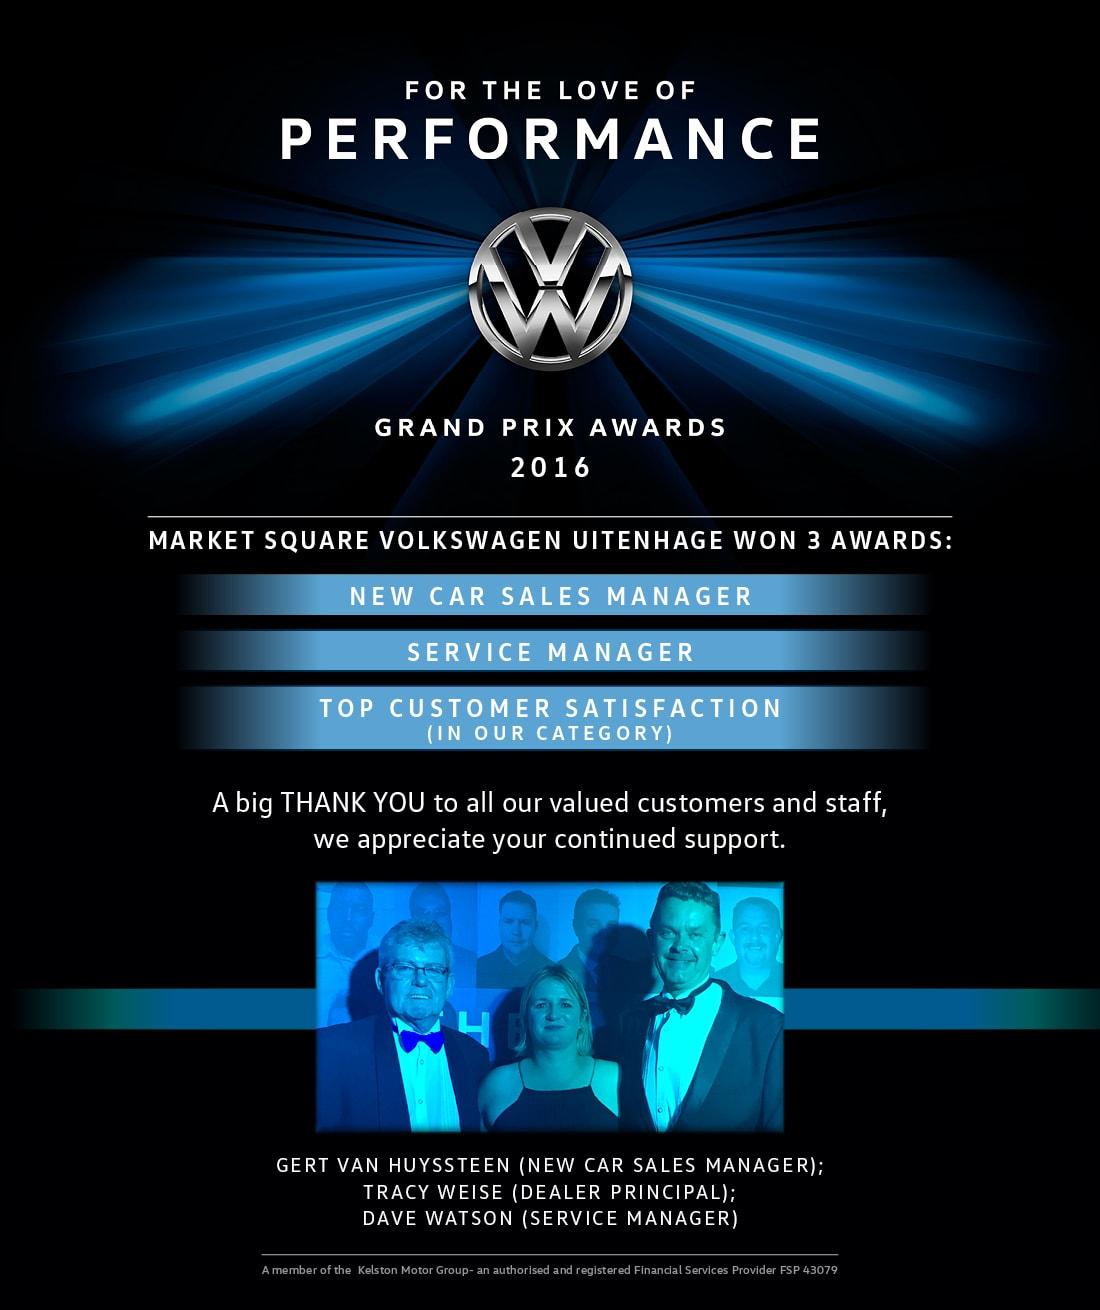 VW Awards 2016